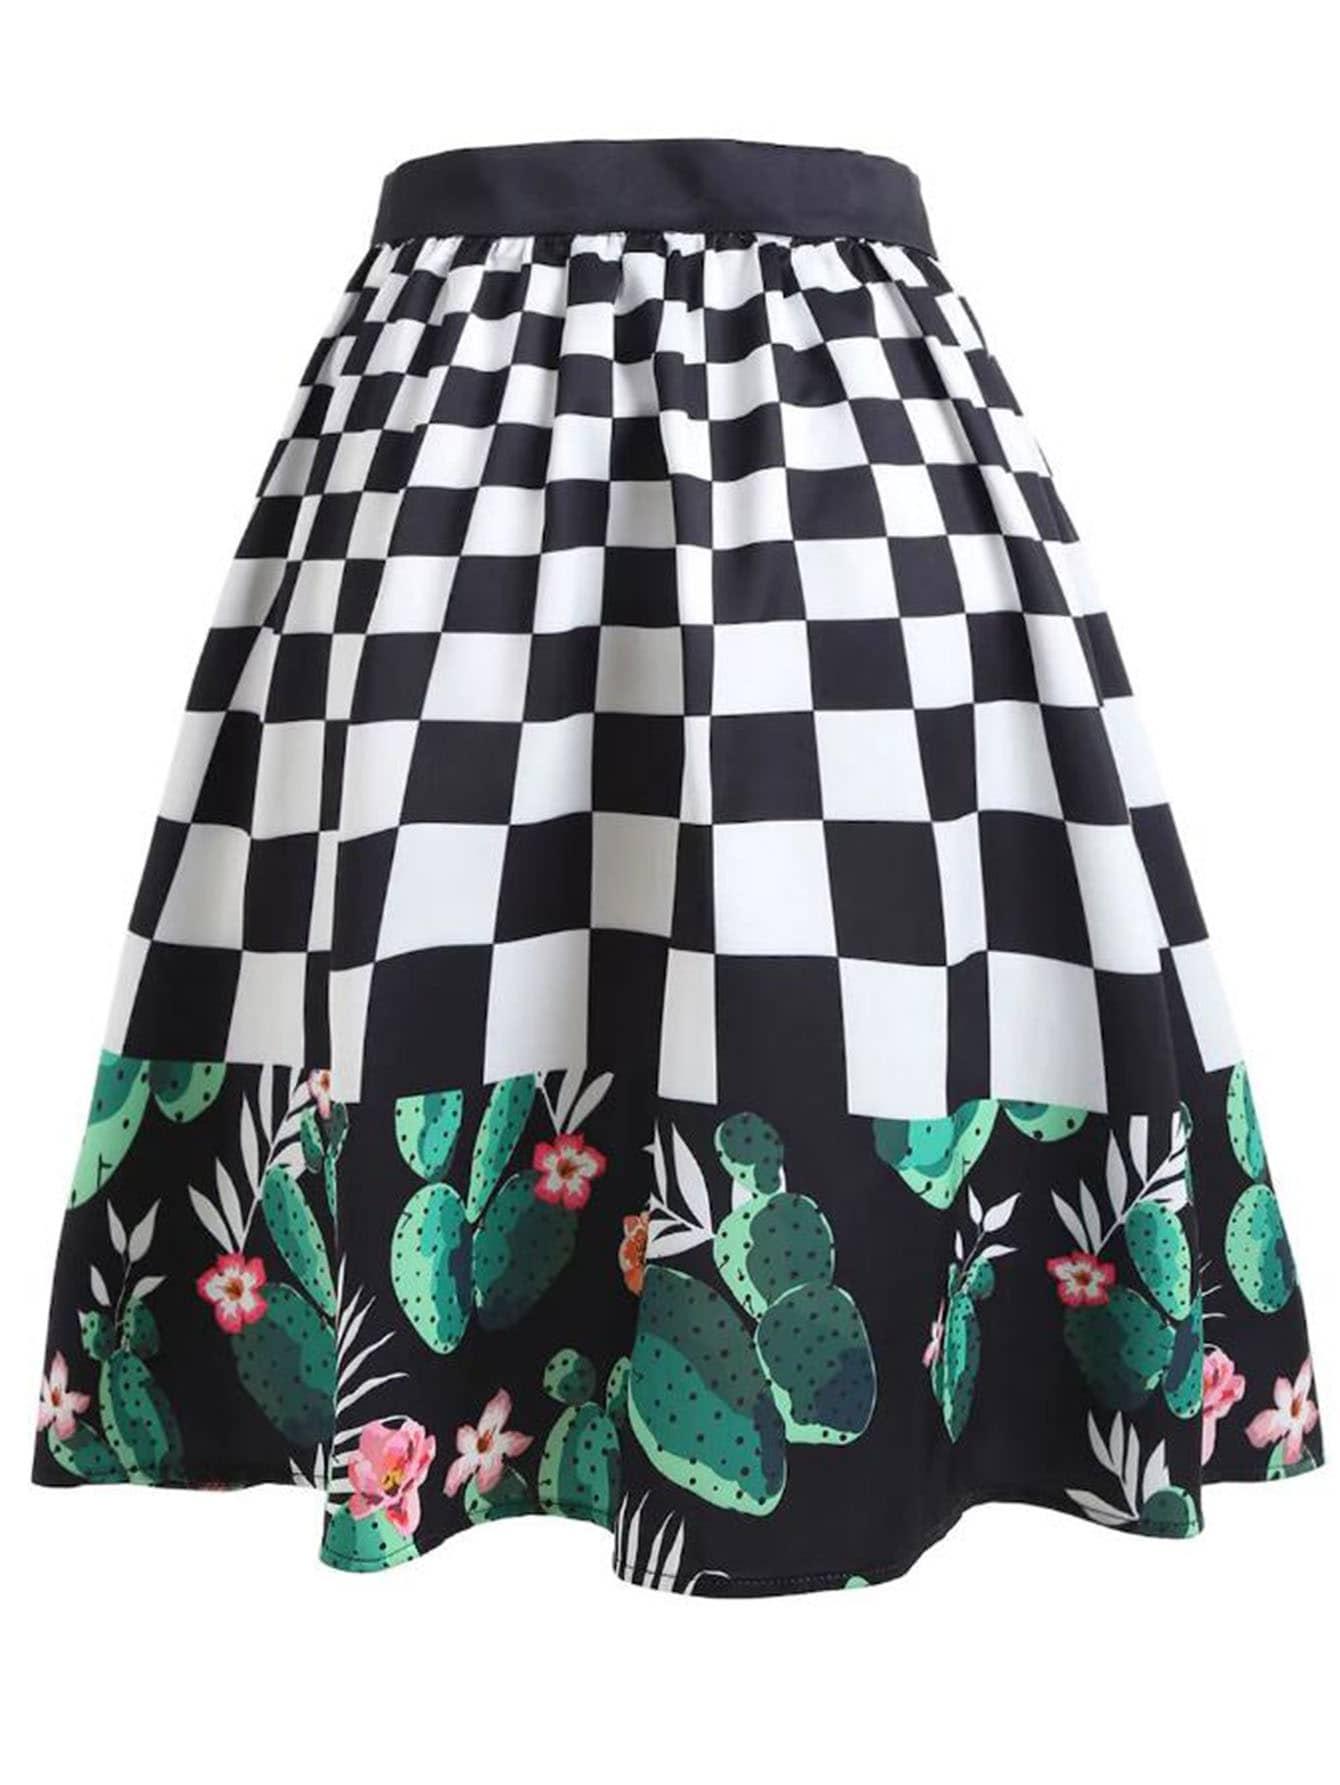 Cactus & Plaid Print Skirt